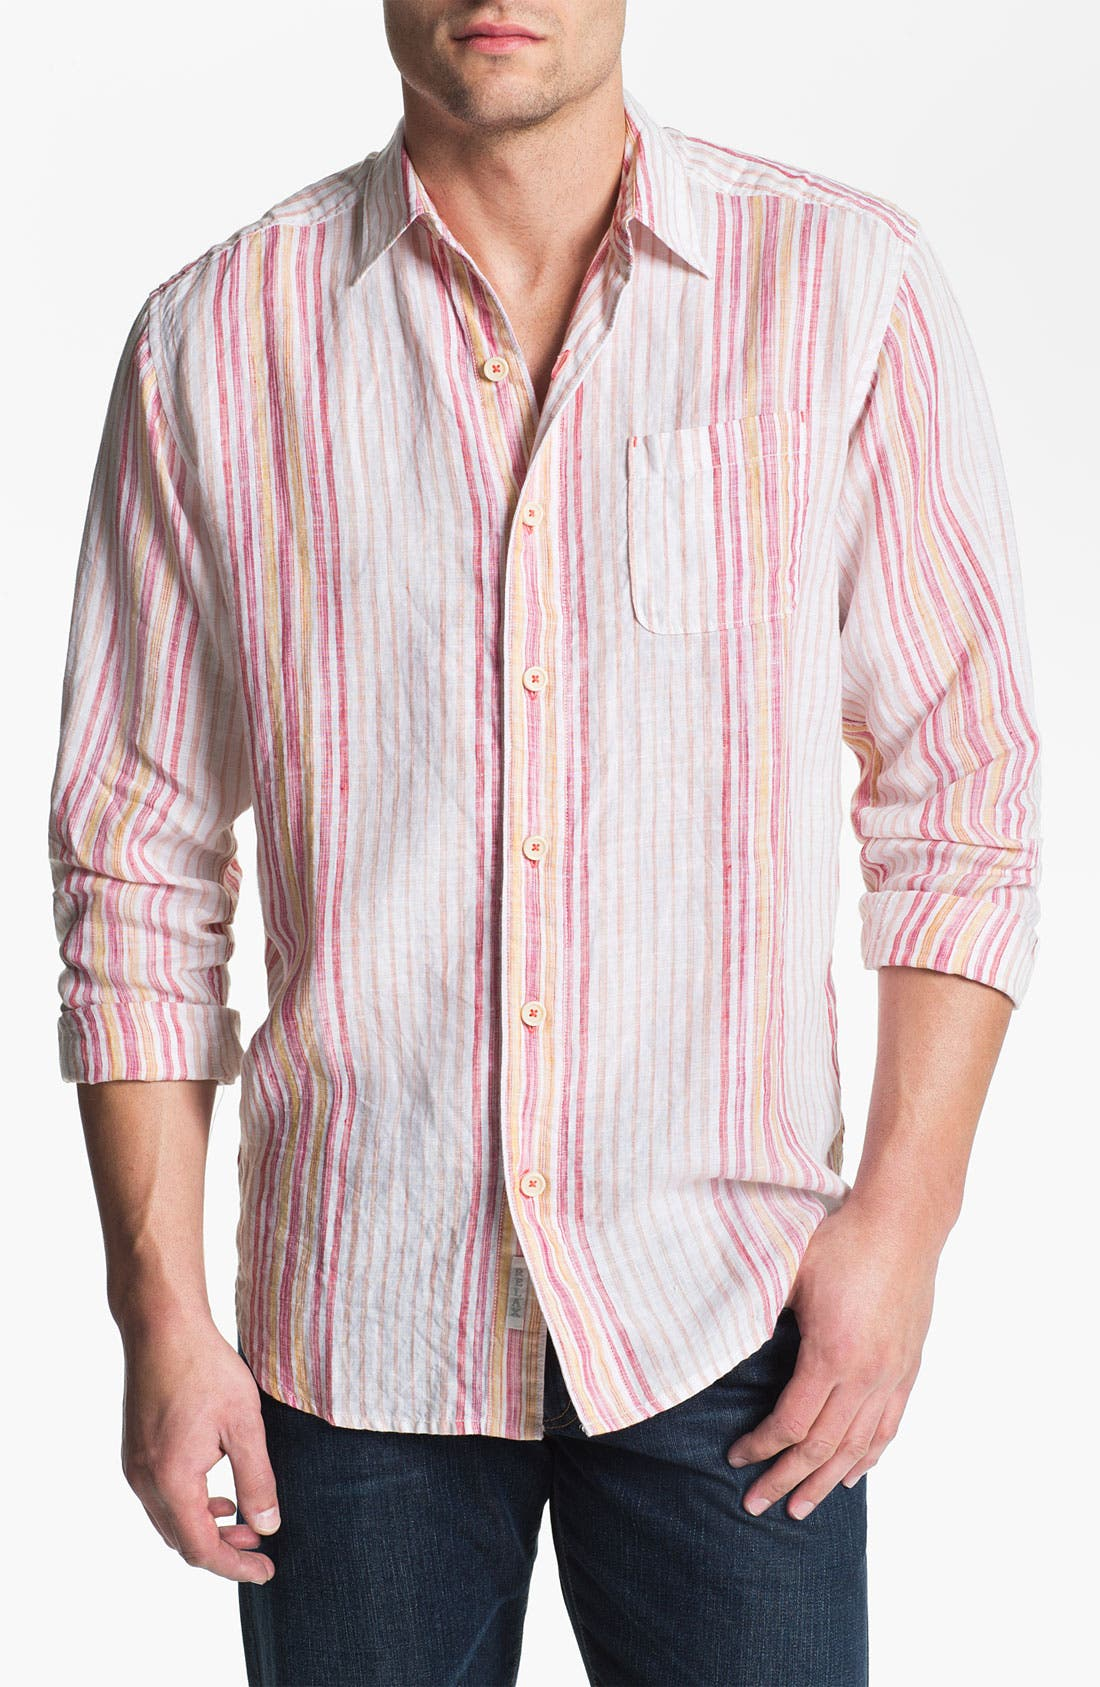 Main Image - Tommy Bahama 'Coconut Lanes' Linen Sport Shirt (Big & Tall)